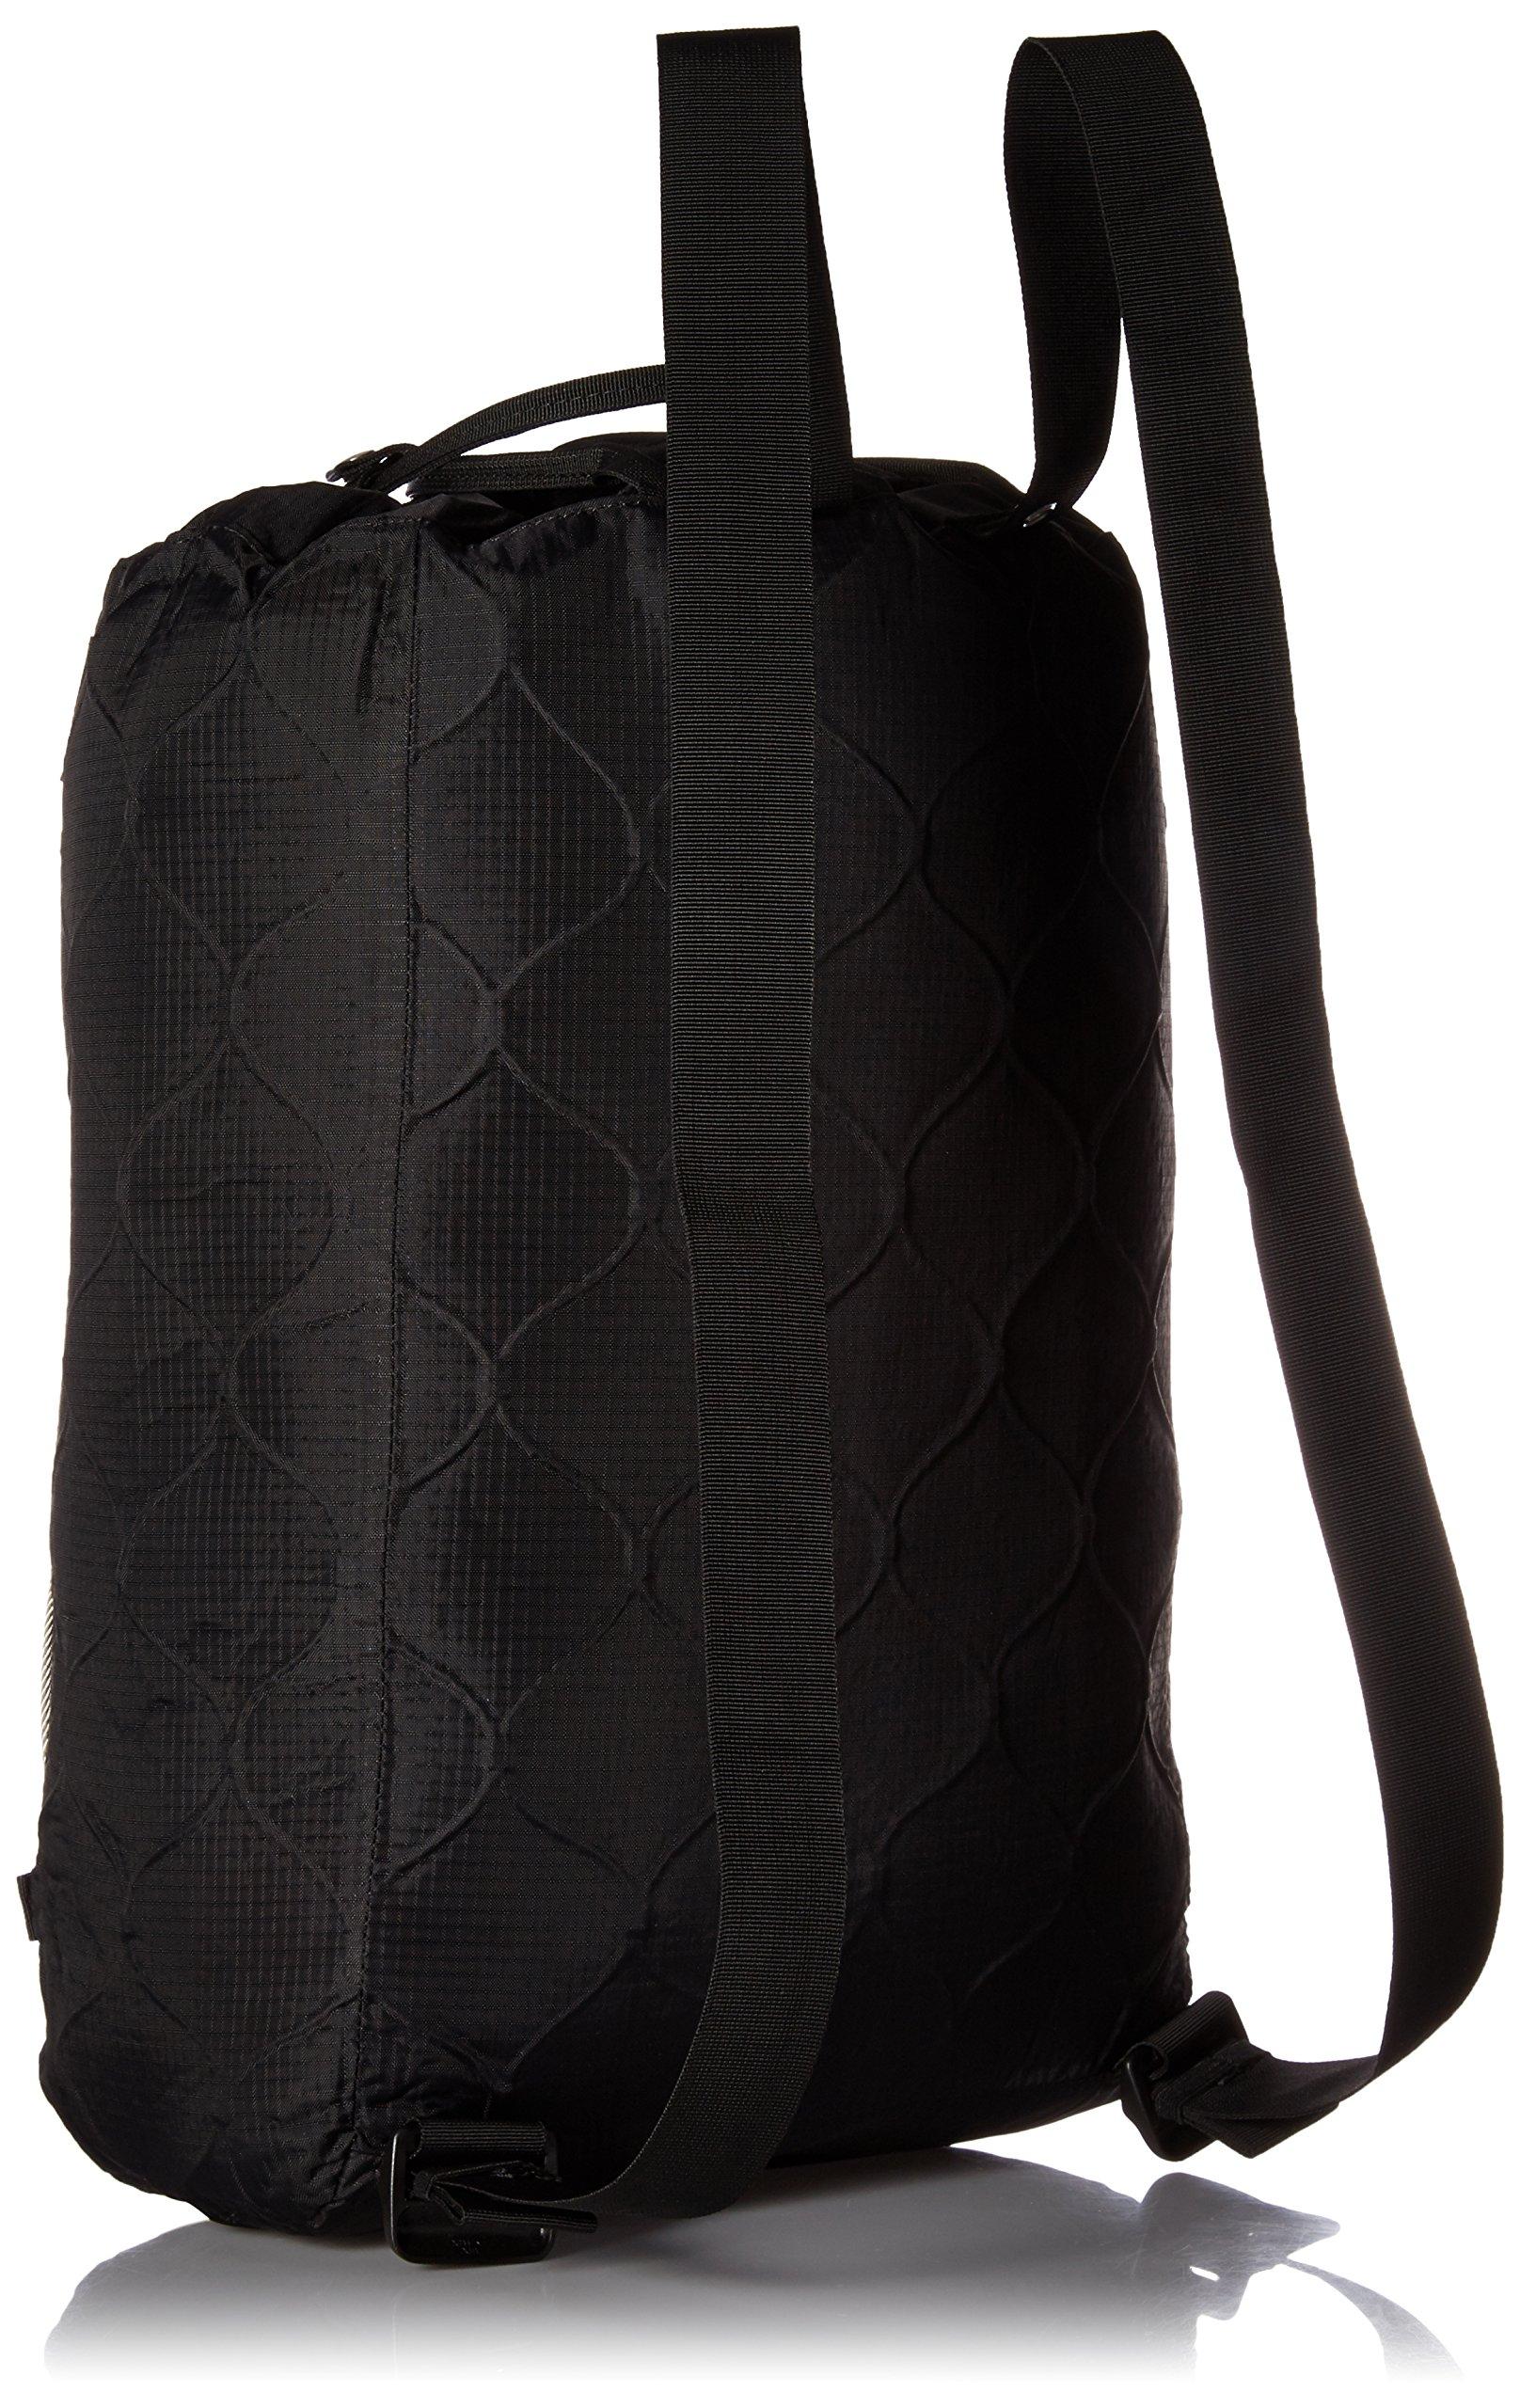 Pacsafe Travelsafe X25 Anti-Theft Portable Safe, Black by Pacsafe (Image #3)